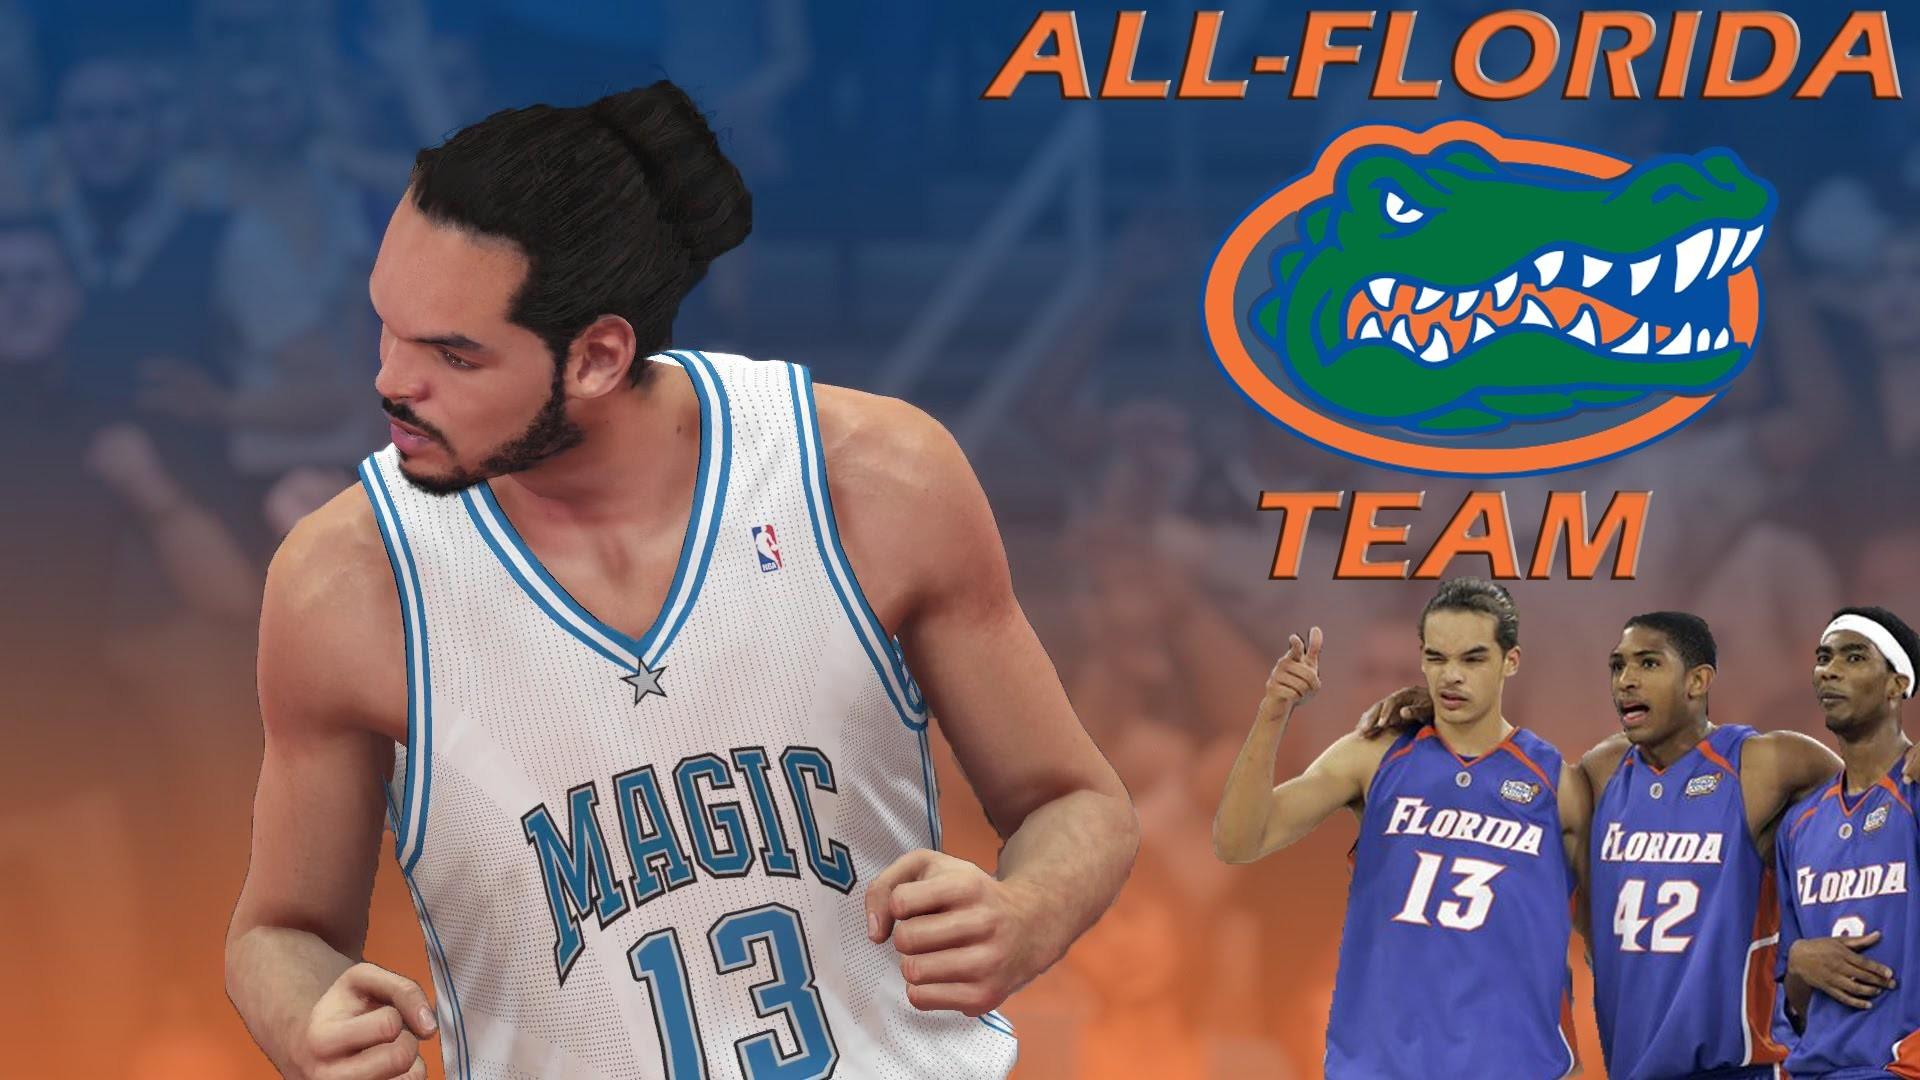 NBA 2k14 MyTeam   All-University of Florida Team – Joakim Noah! (NBA 2k14  My Team) (NBA 2K14 MyTeam) – YouTube